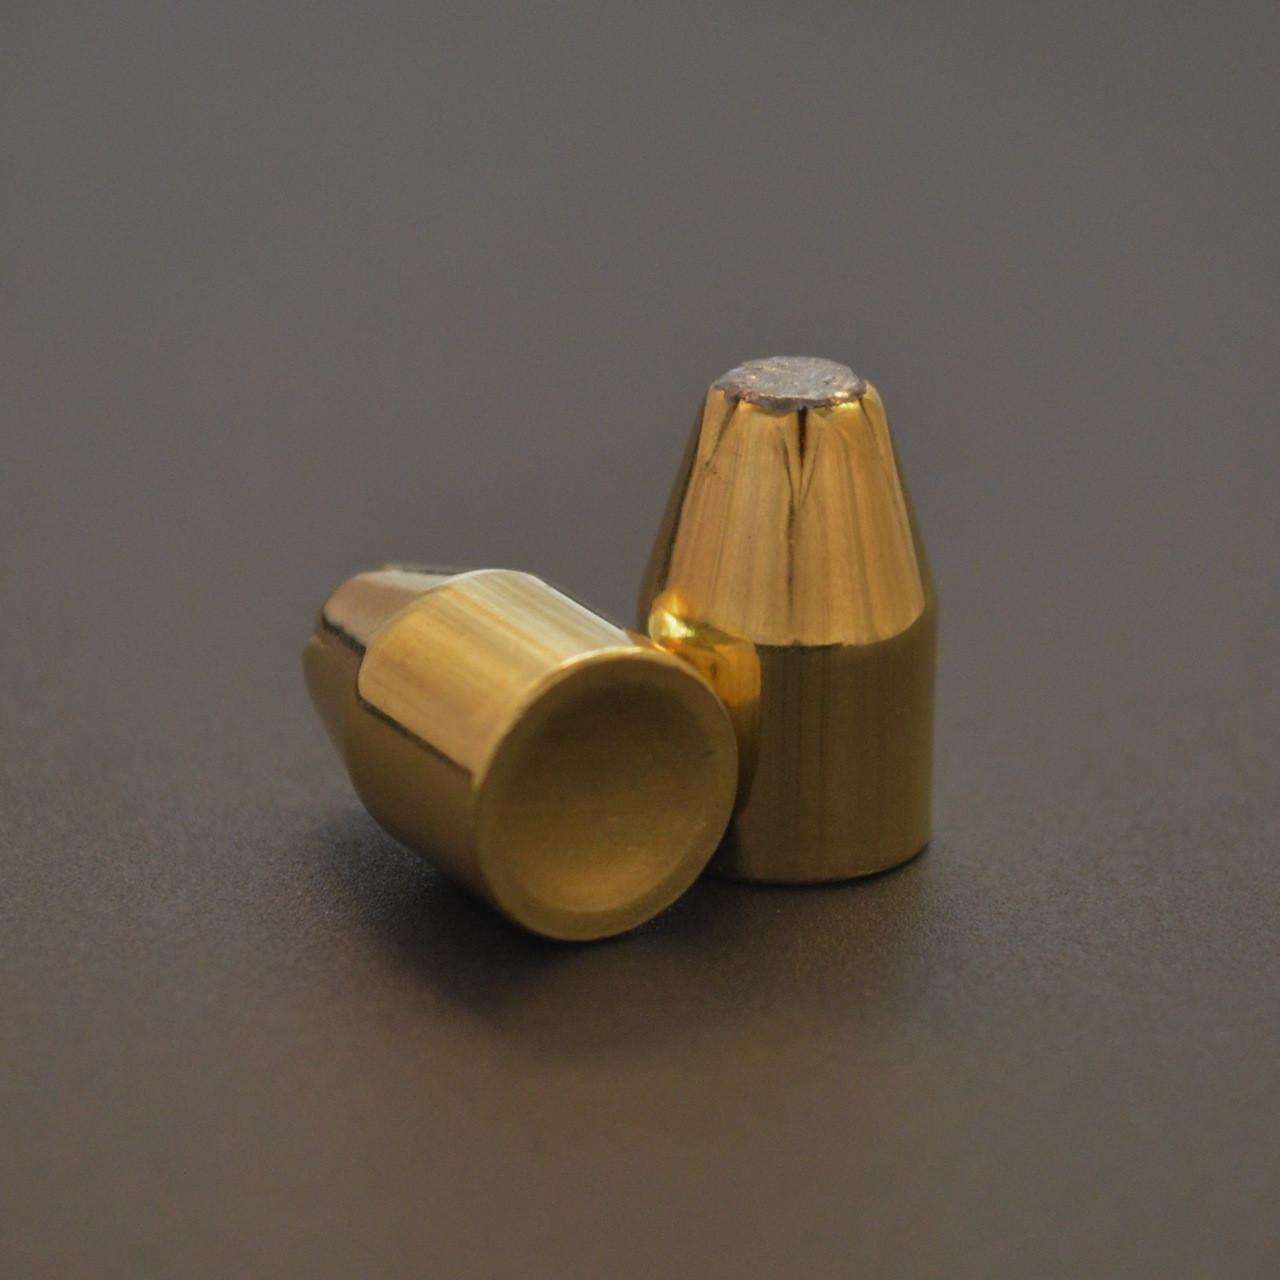 9mm/121gr IFP - 100ct